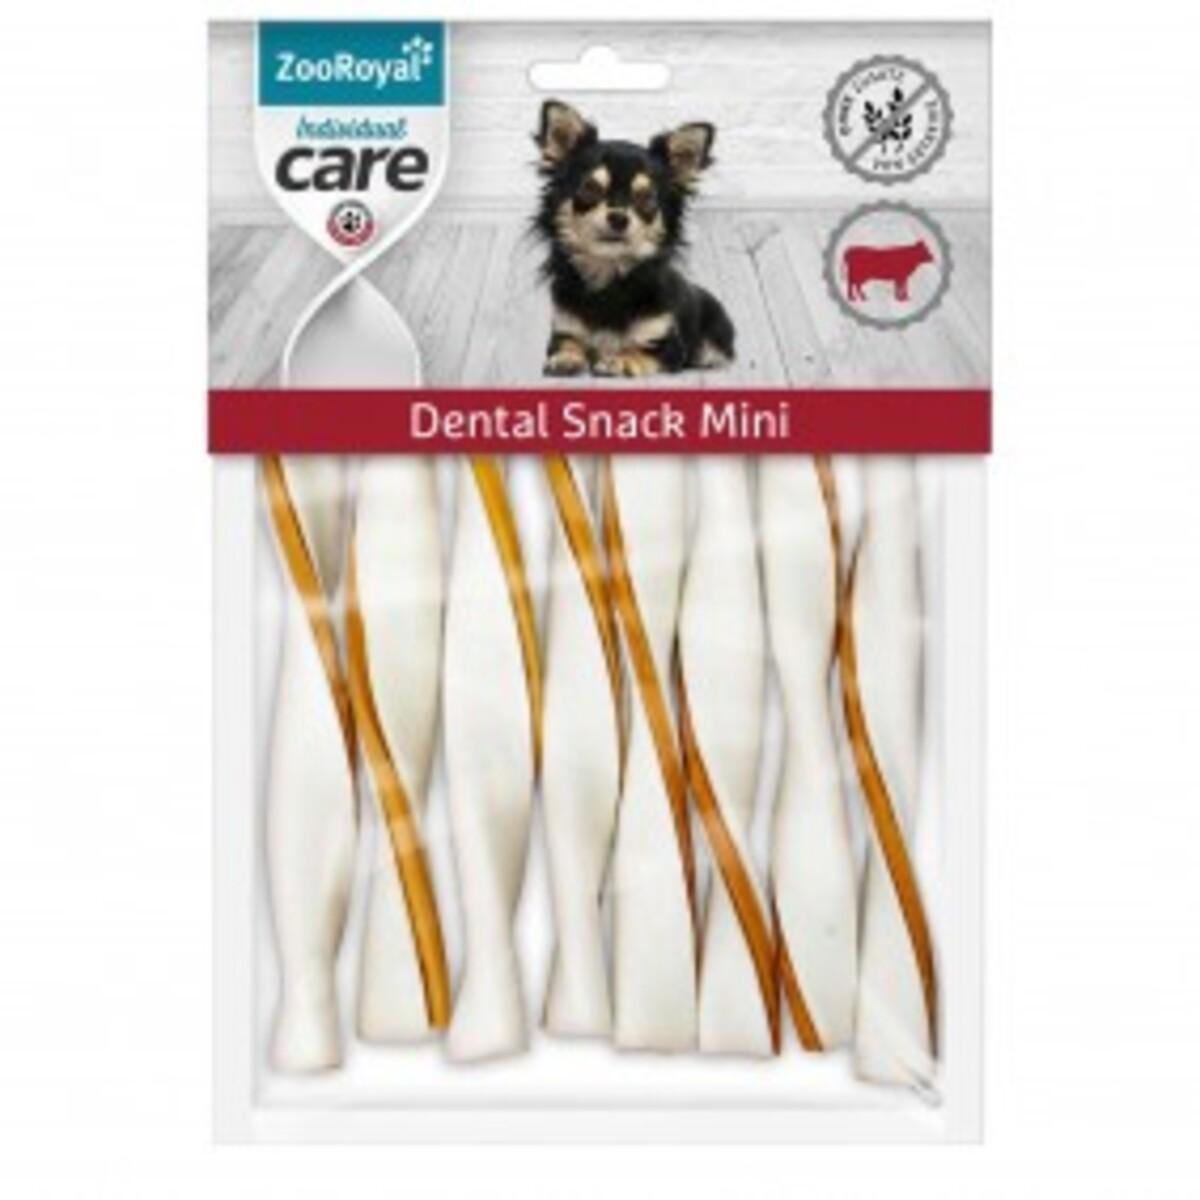 Bild 5 von ZooRoyal Individual care Dental Snack Mini 3x8 Stück